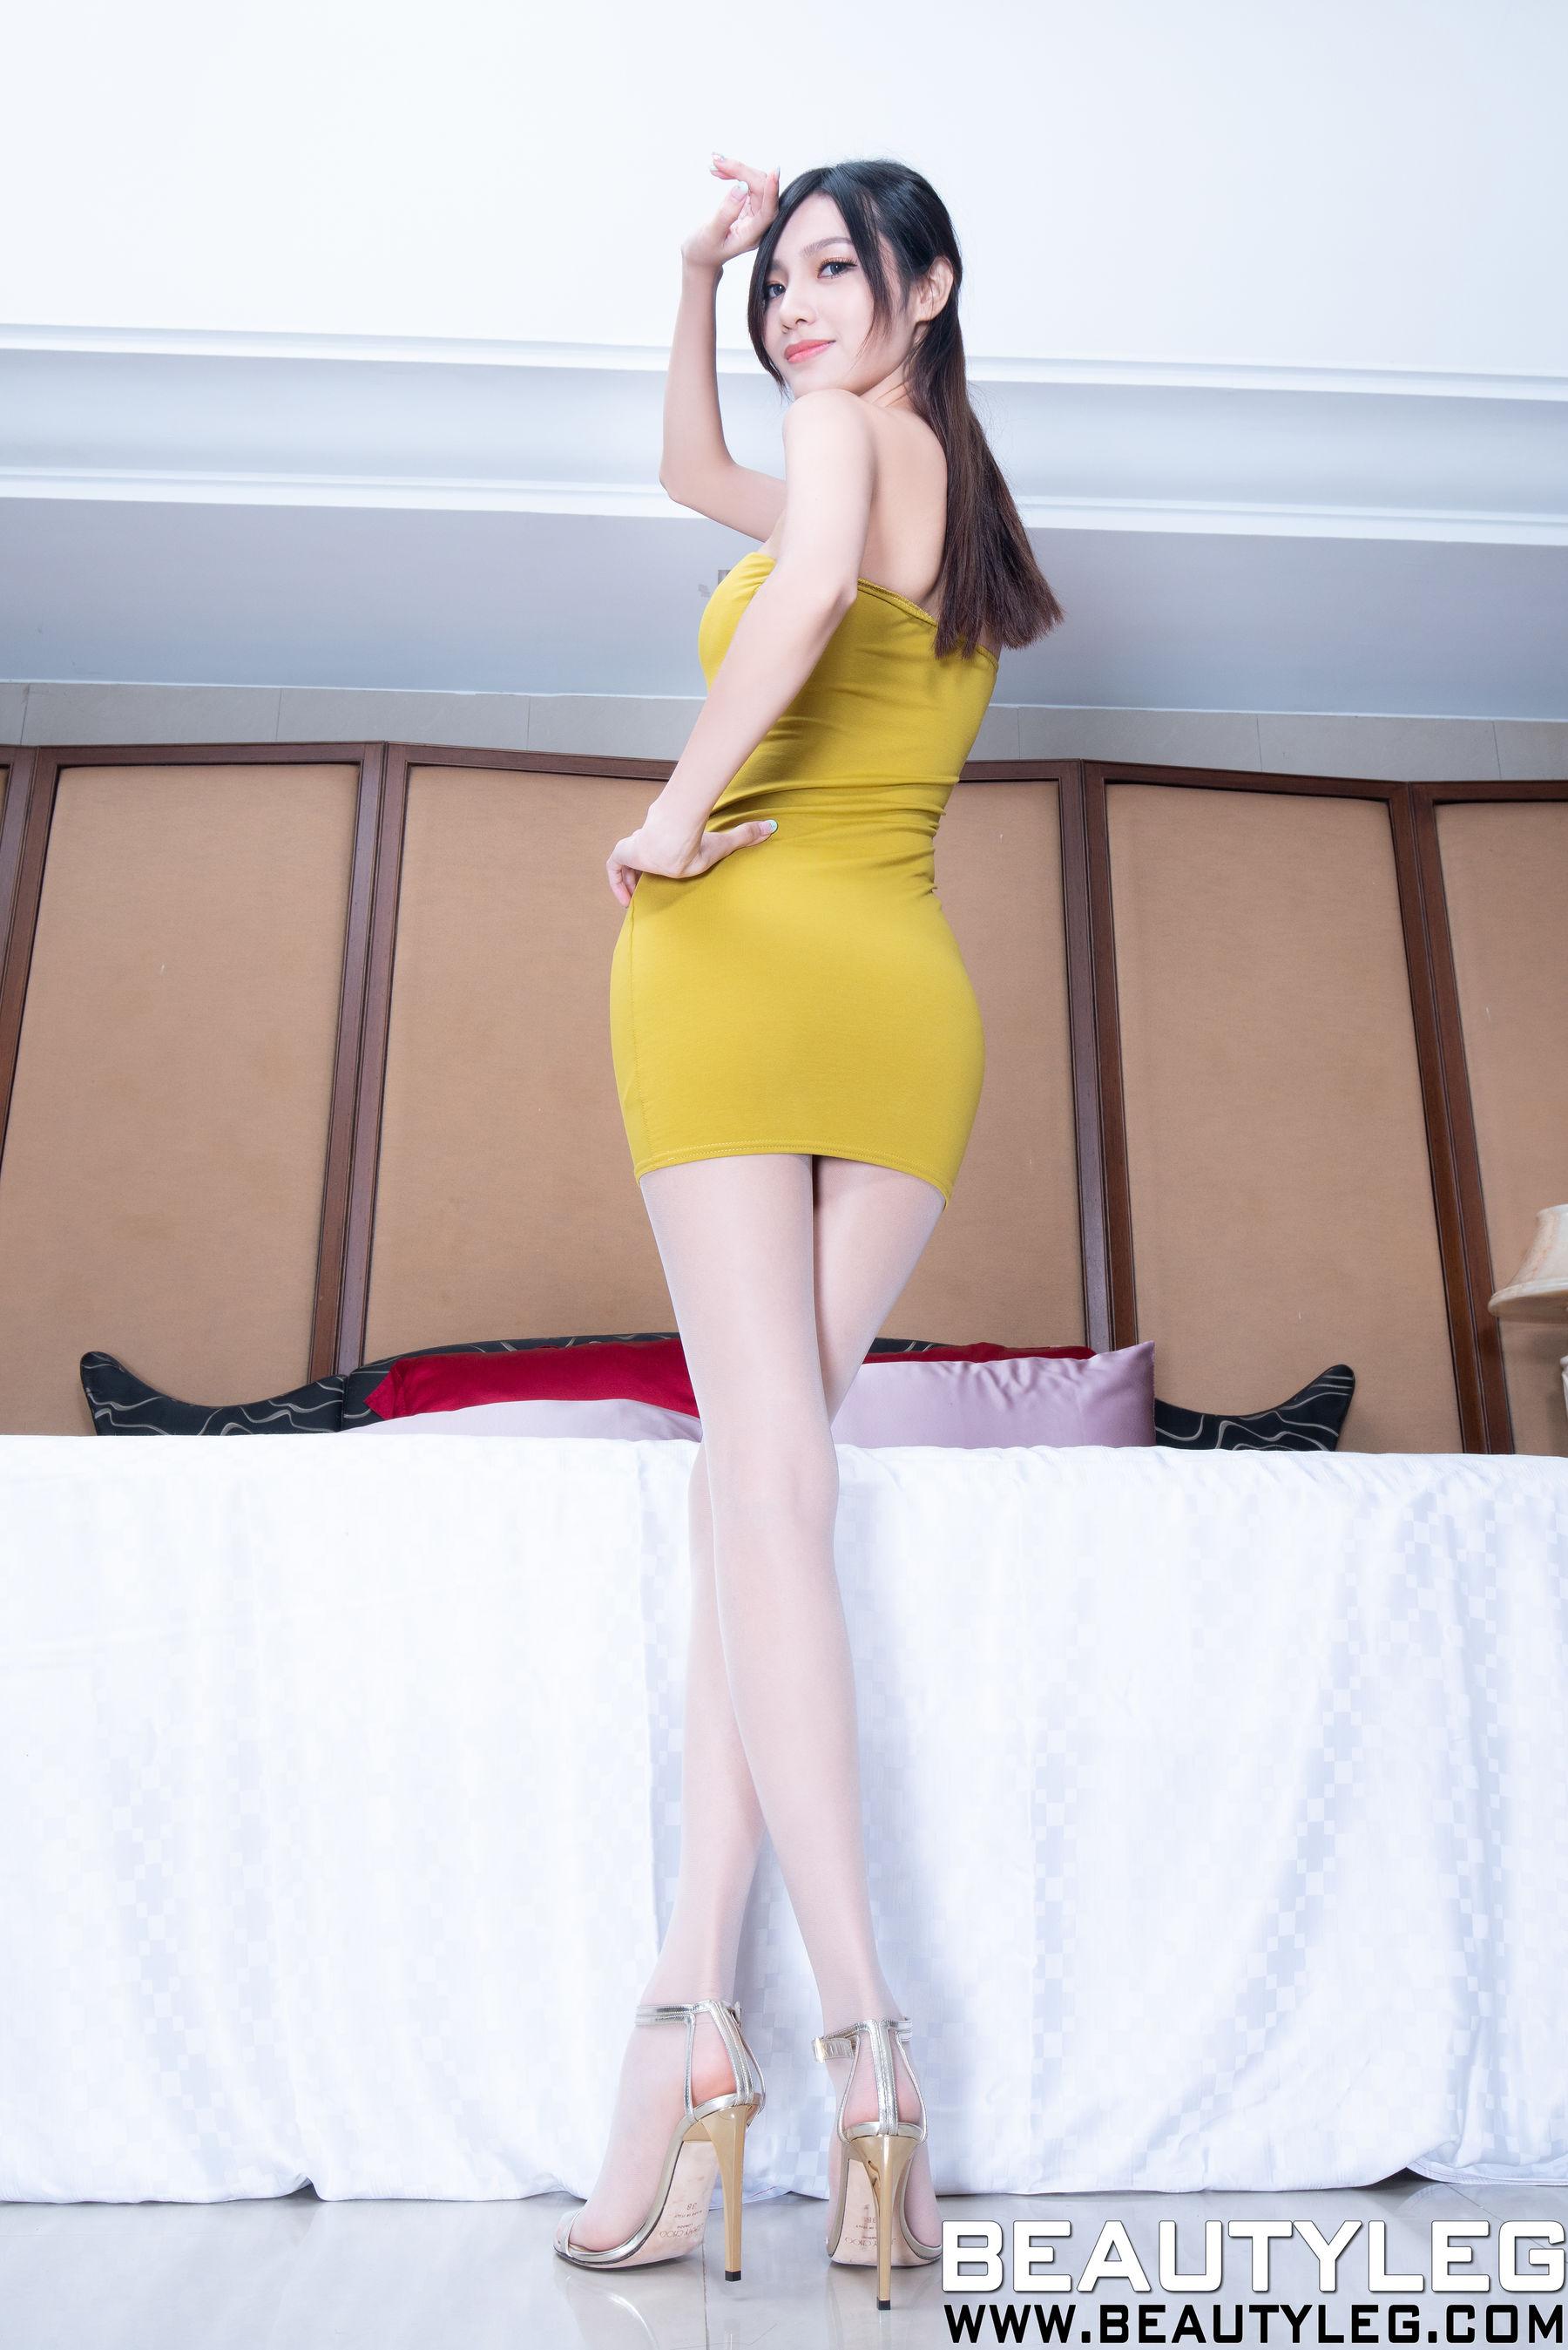 VOL.692 [Beautyleg]丝袜美腿包臀裙美女长腿美女:林昱(腿模Lynn)超高清个人性感漂亮大图(43P)